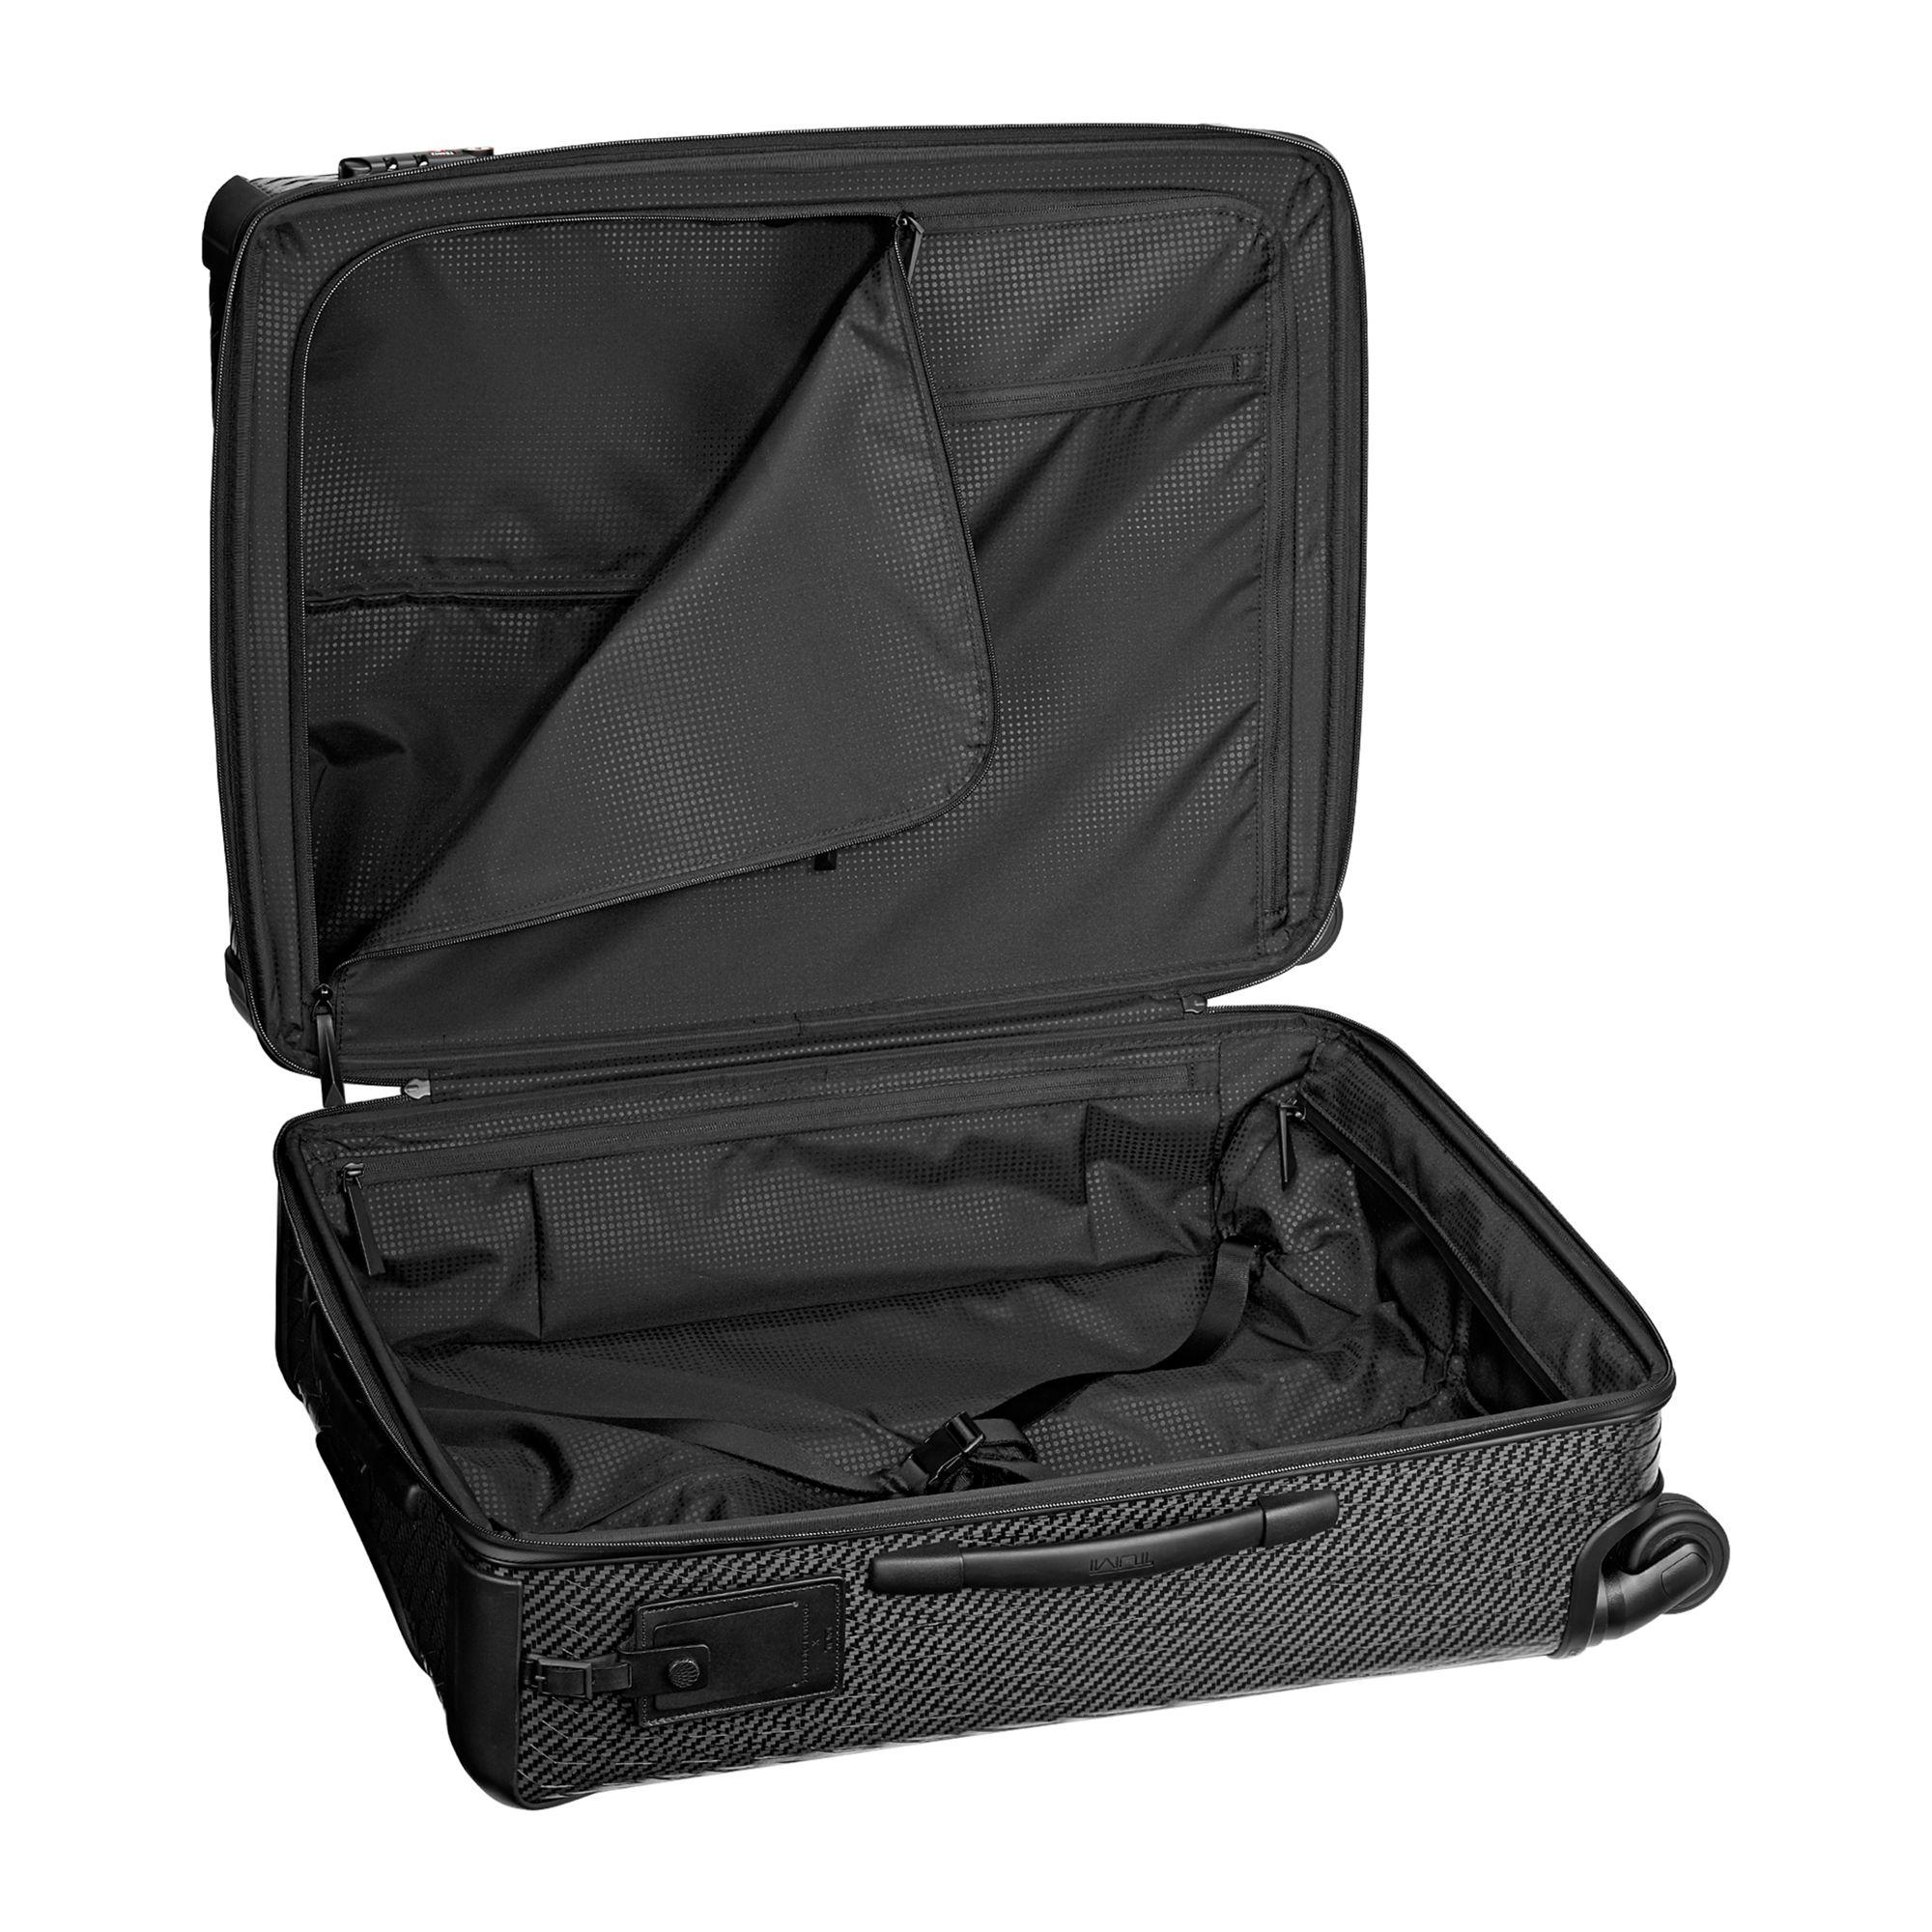 Tumi-Public-School-suitcase-2.jpeg